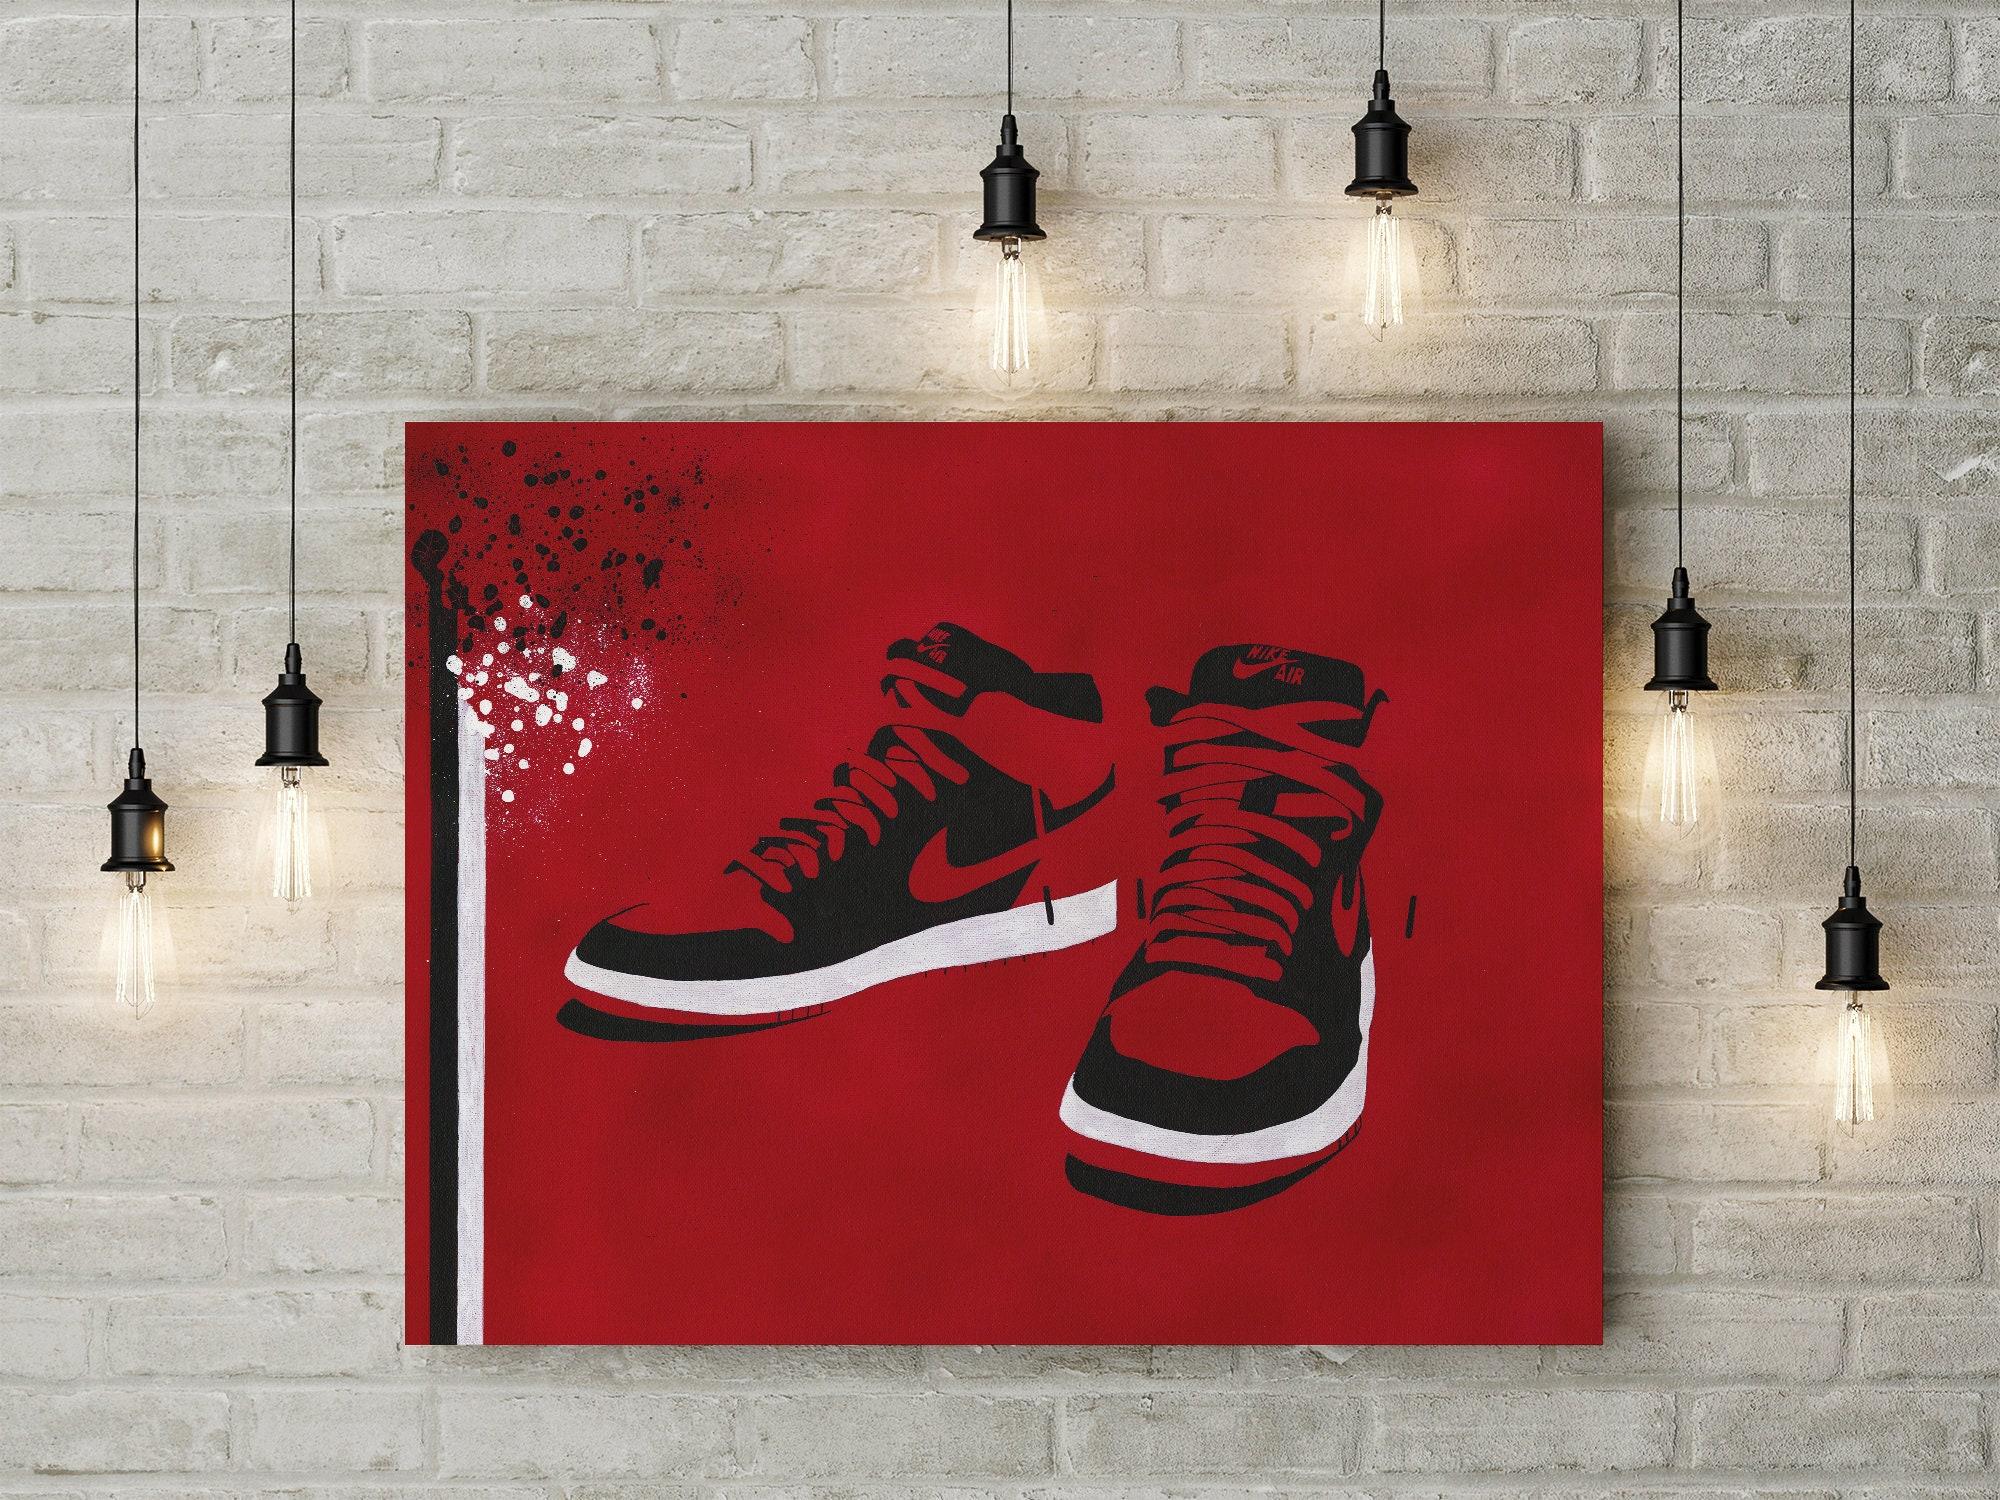 half off 2d0ba 62b1a Nike Air Jordan Druck. Limitierte Auflage. Air Jordan   Nike   Etsy